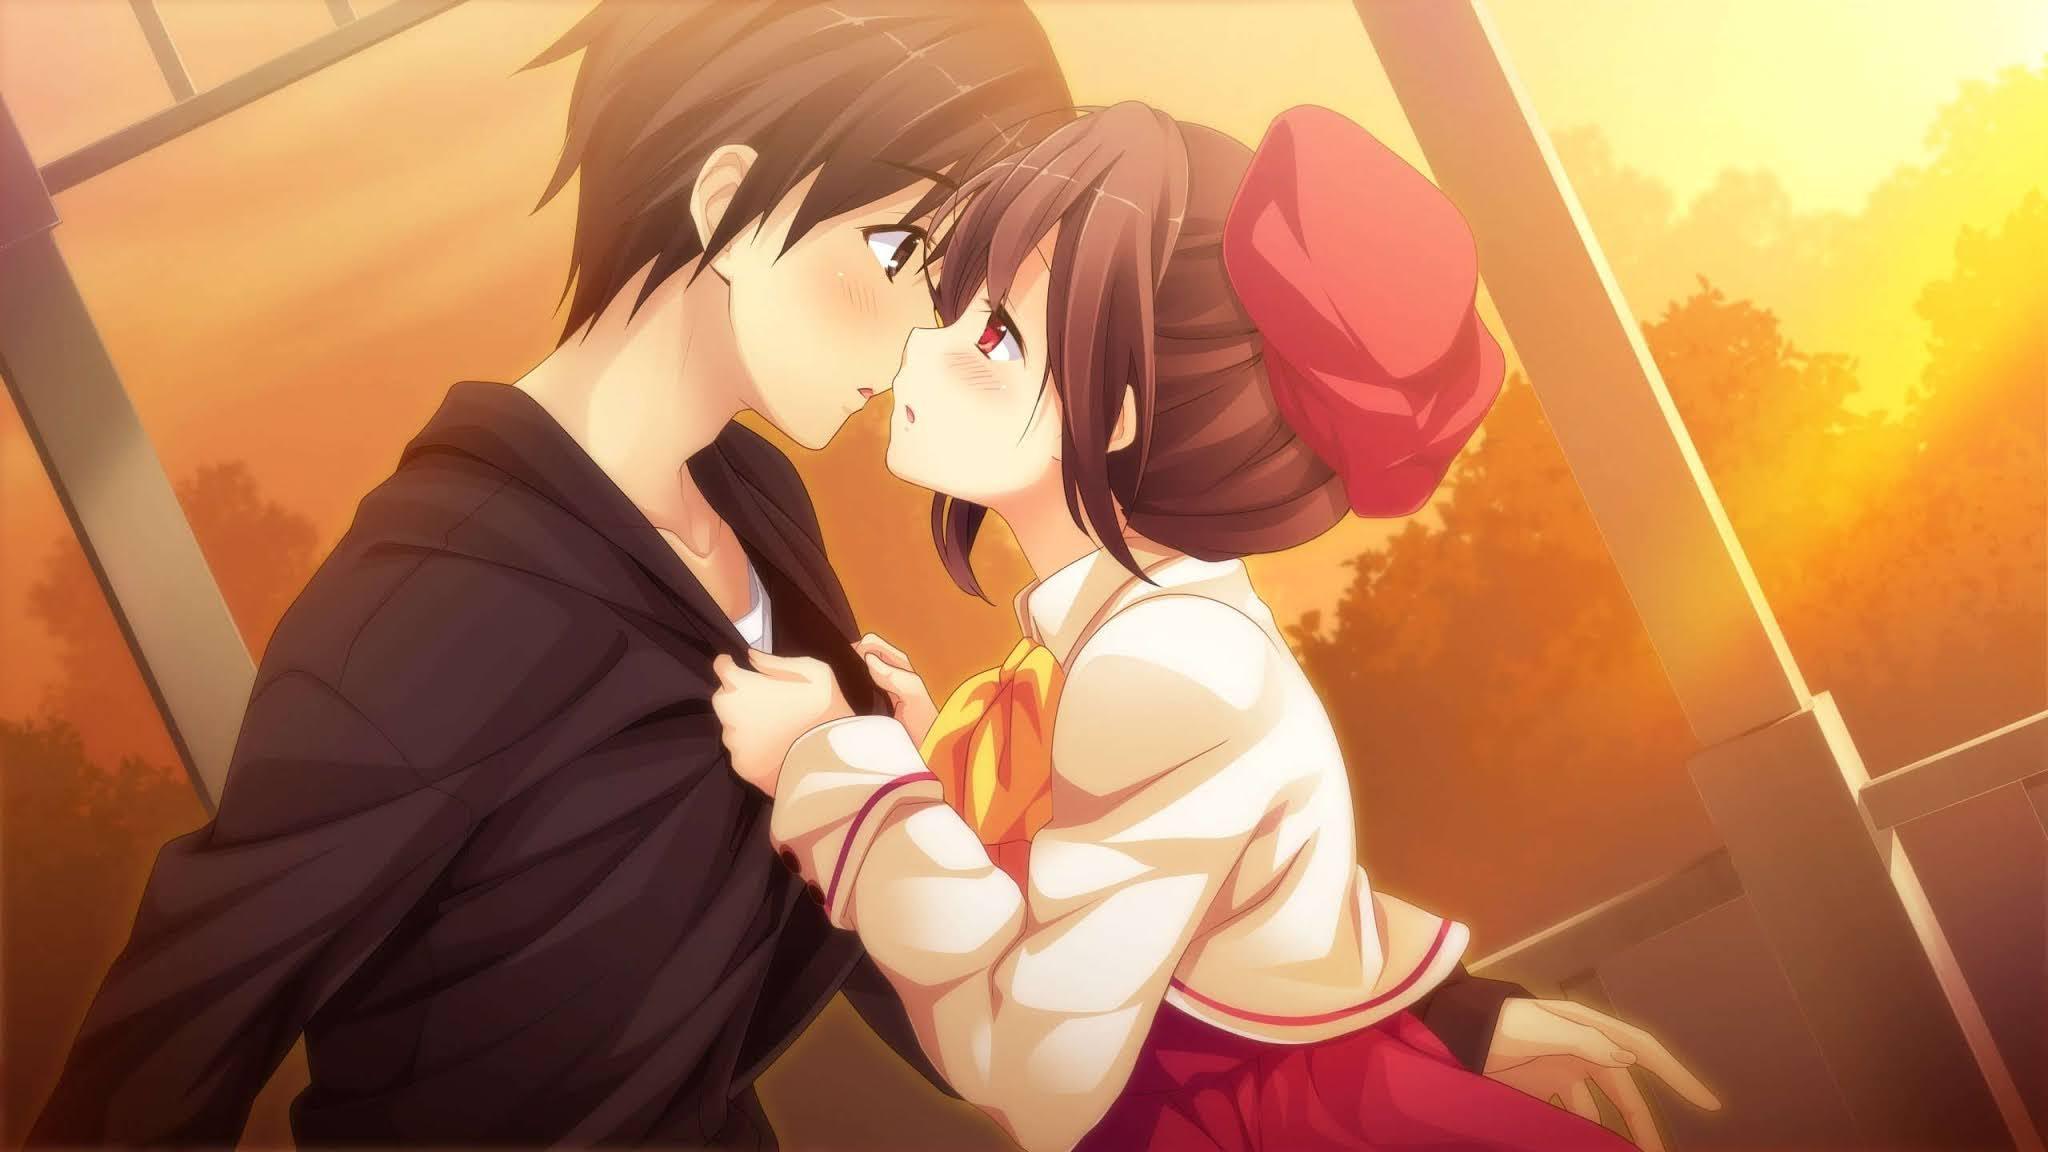 Gambar anime romantis komputer